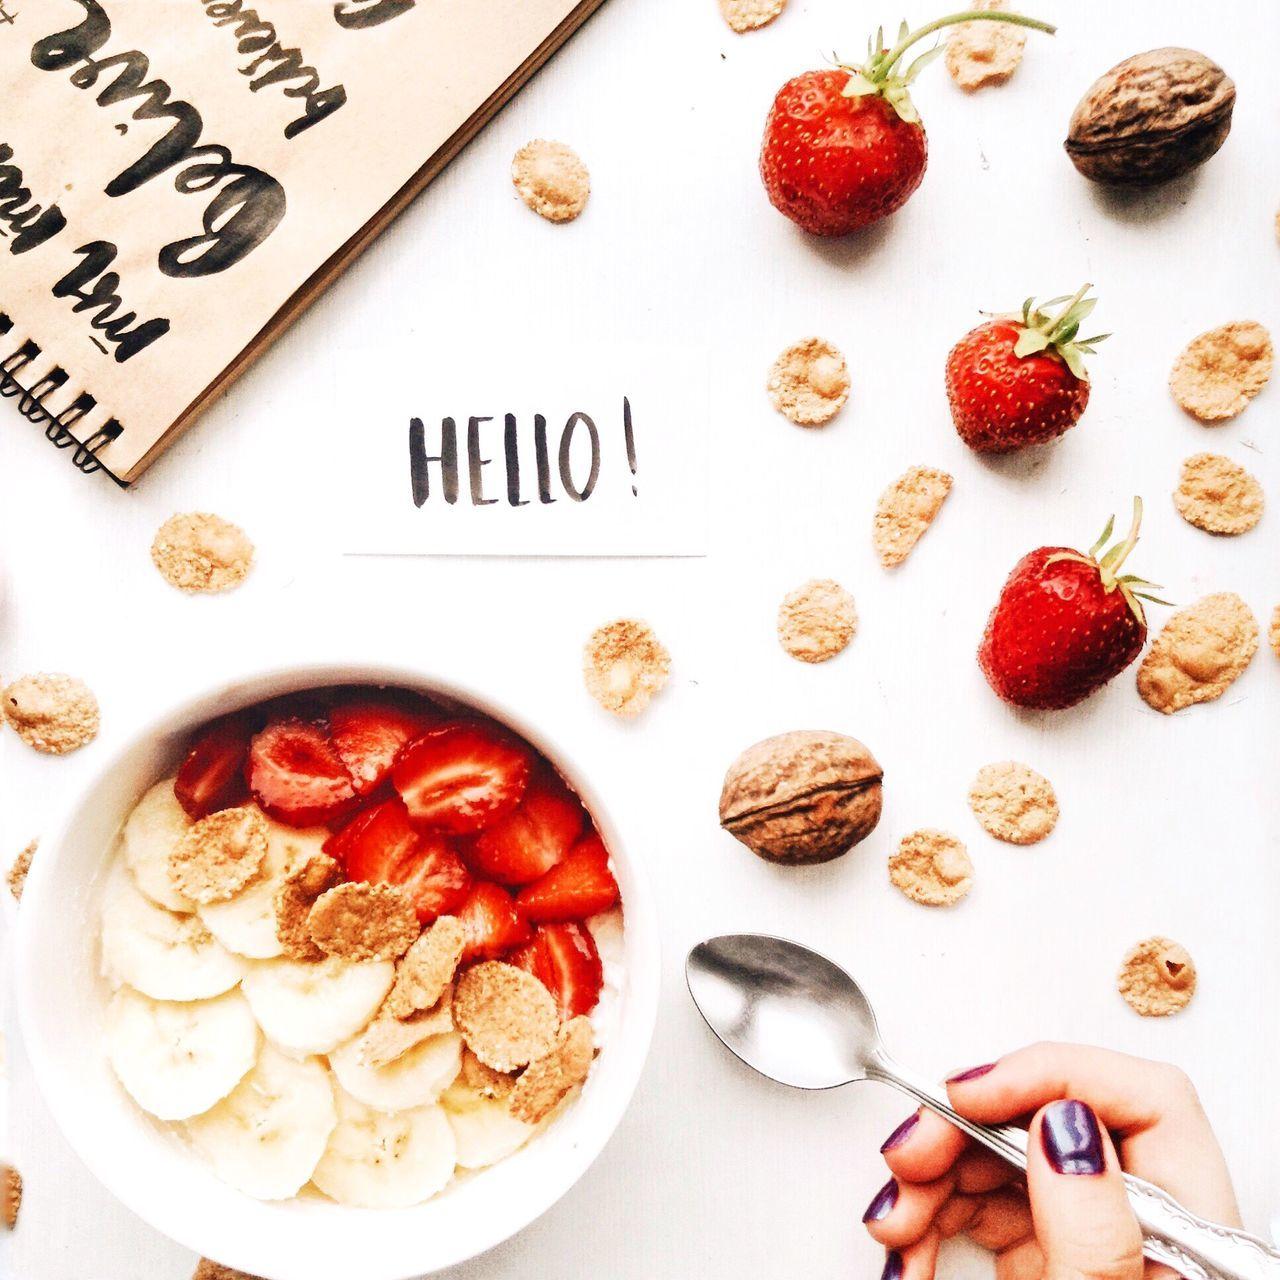 Flatlay Flatlay Onmytable Ontable Hand Breakfast